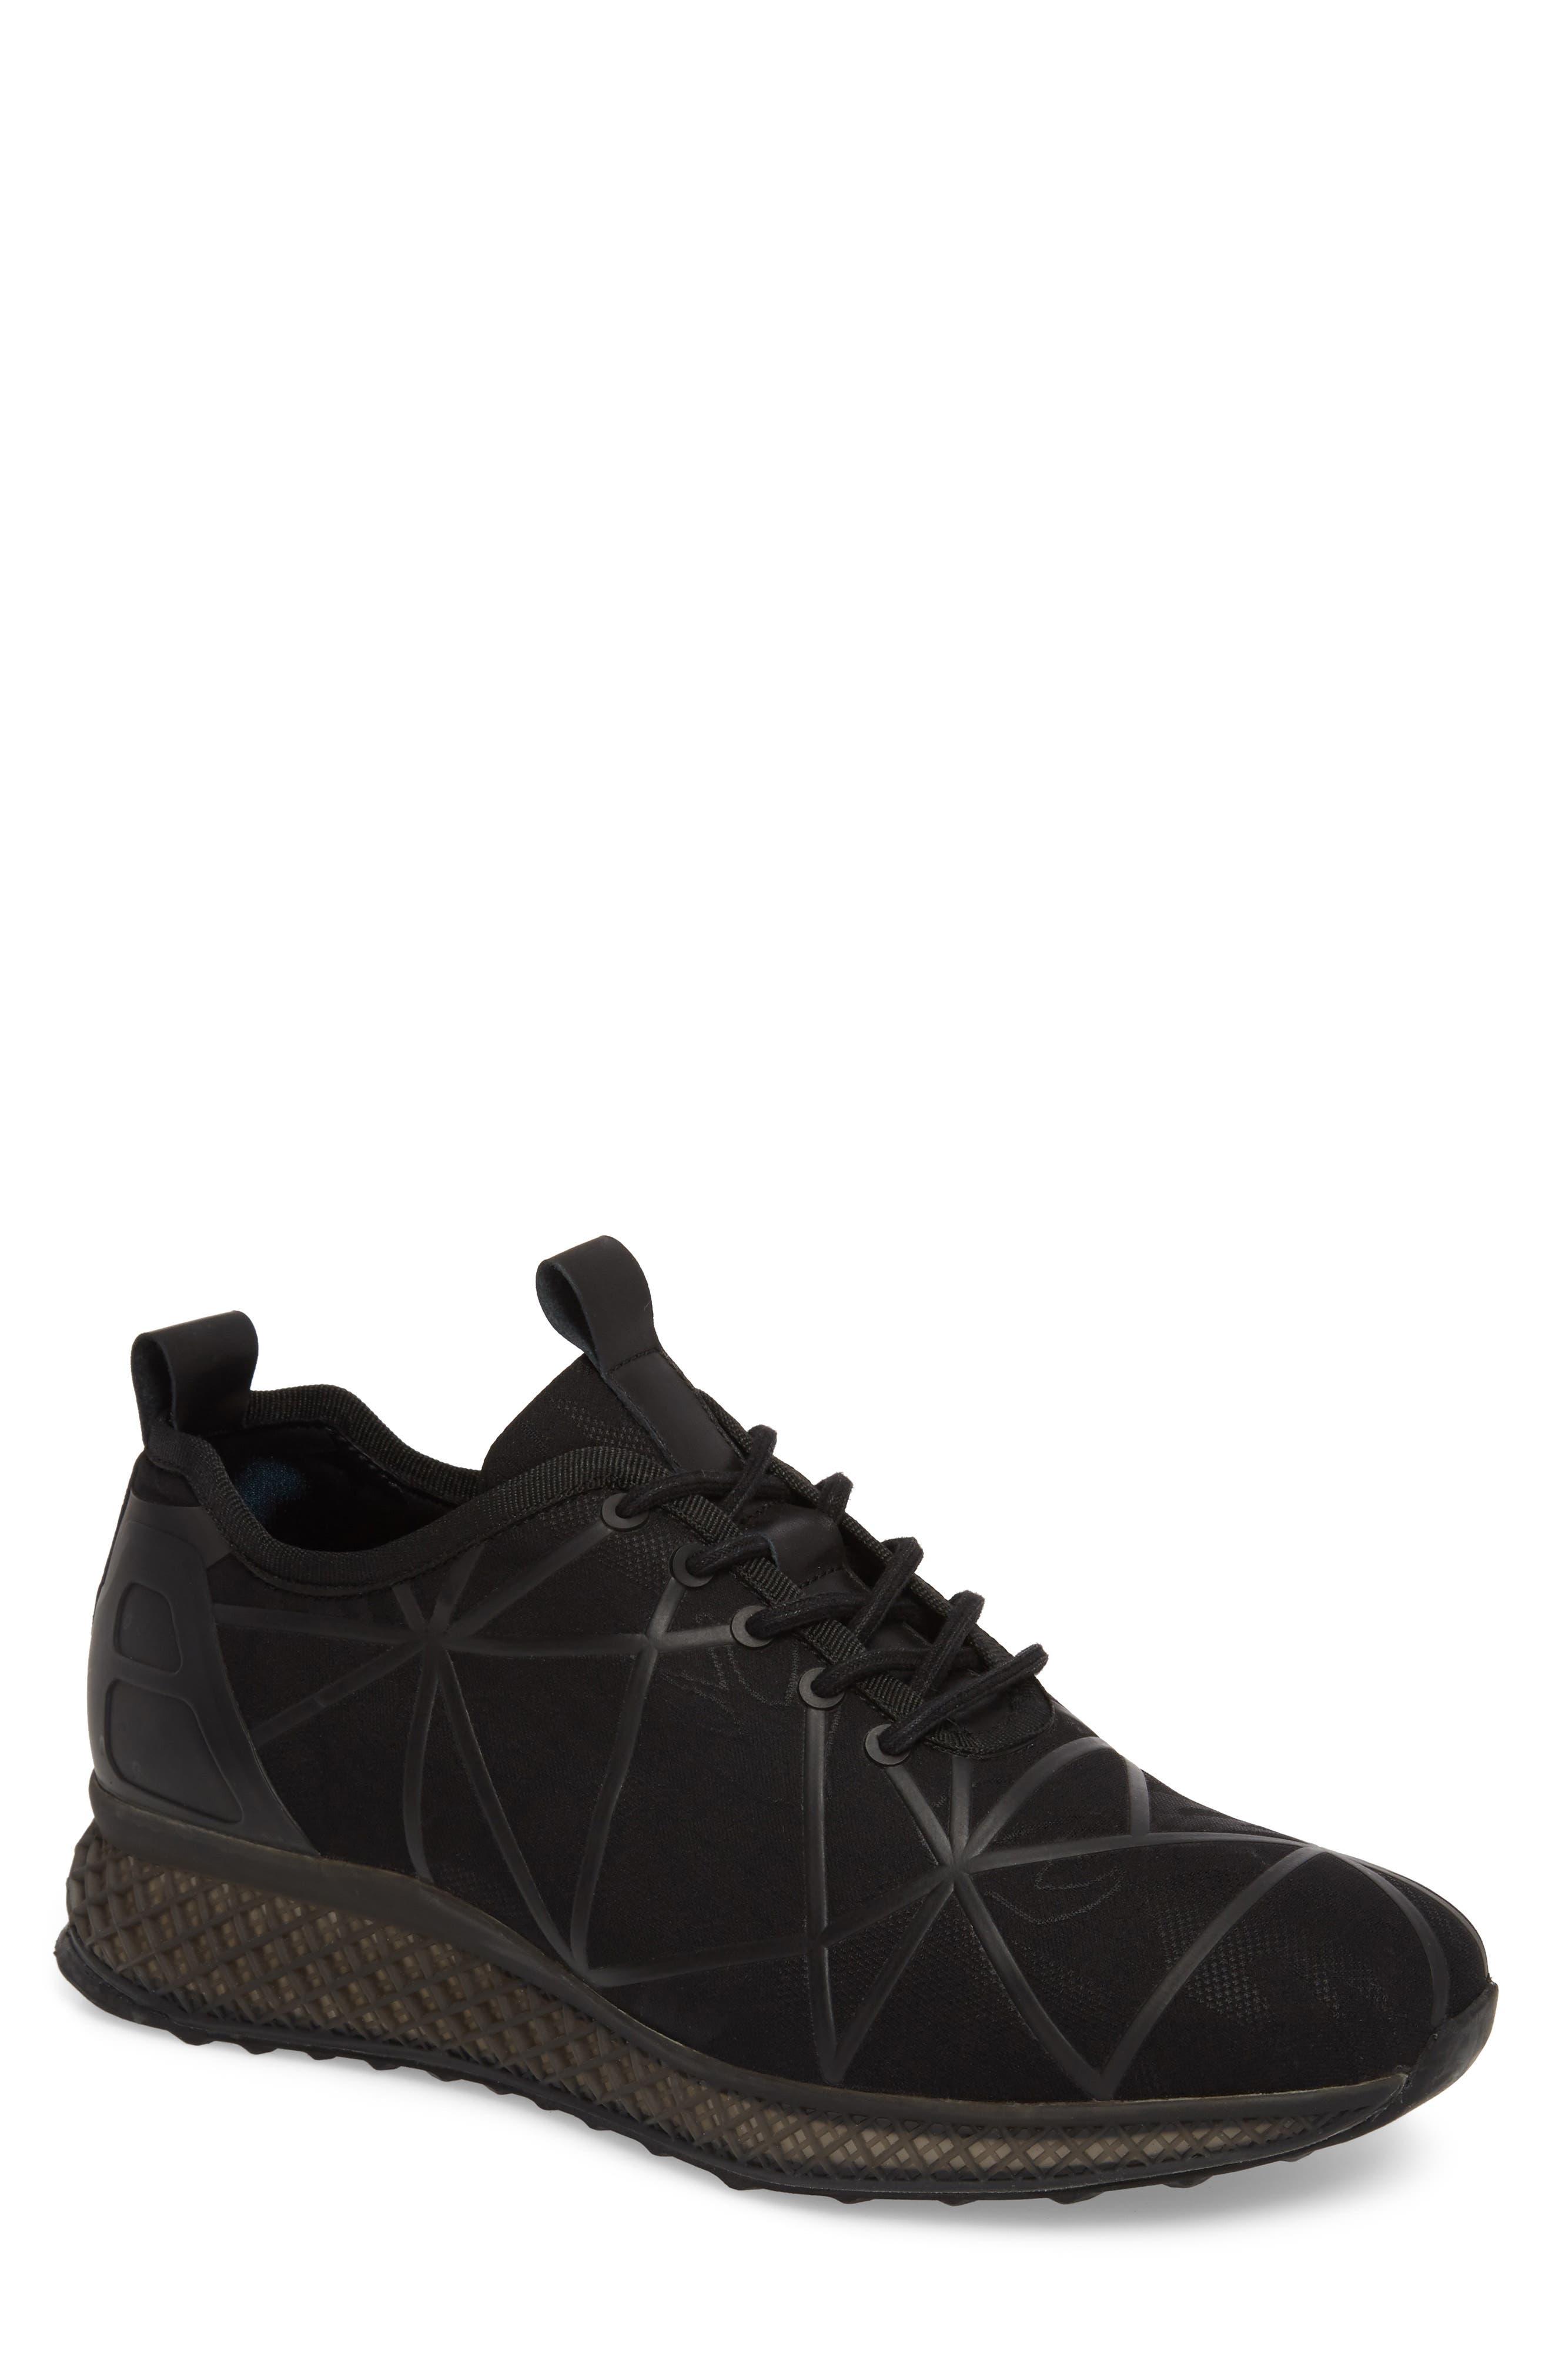 Karl Lagerfeld Paris Criss Cross Sneaker (Men)